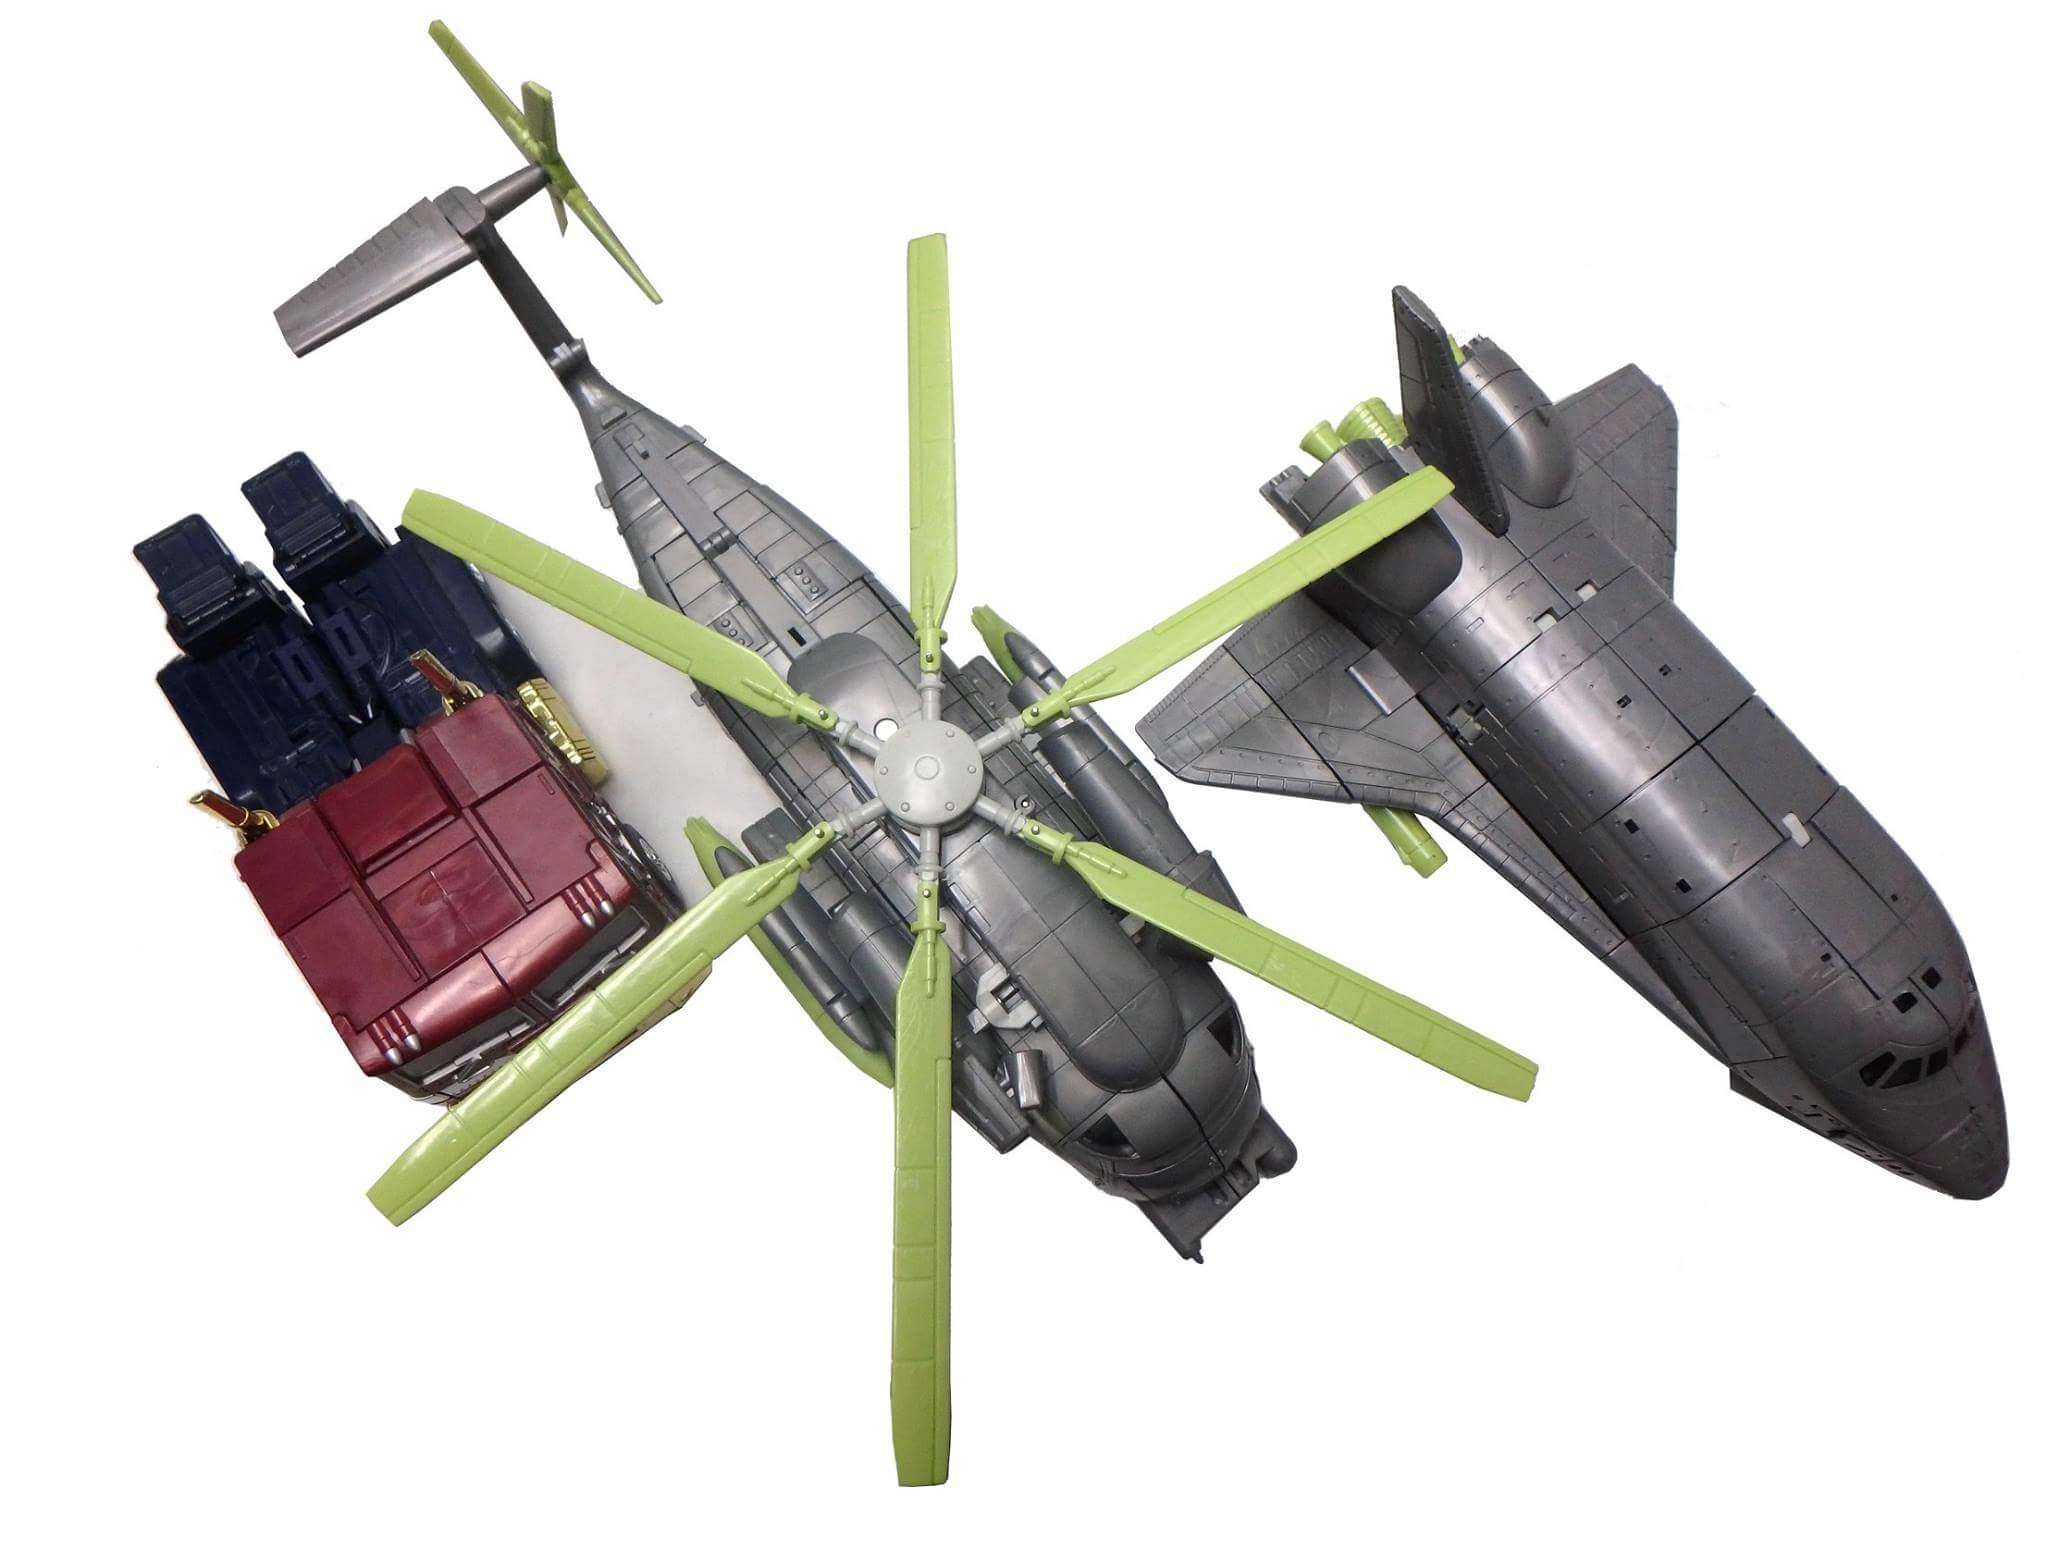 [Zeta Toys] Produit Tiers - Armageddon (ZA-01 à ZA-05) - ZA-06 Bruticon - ZA-07 Bruticon ― aka Bruticus (Studio OX, couleurs G1, métallique) ZwZLTiTu